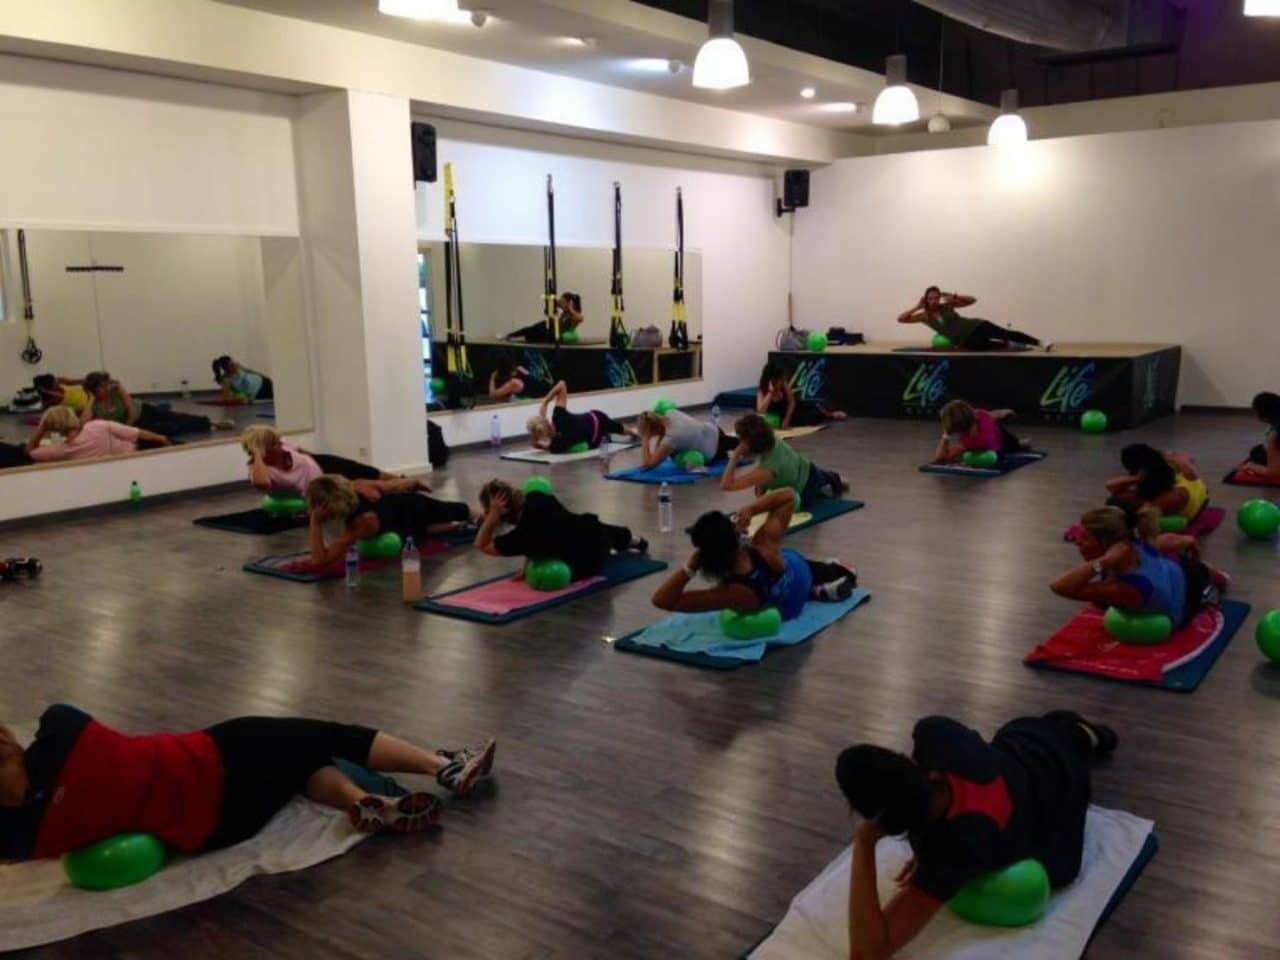 salle-de-fitness-avignon-lifeclub-1280x960.jpeg